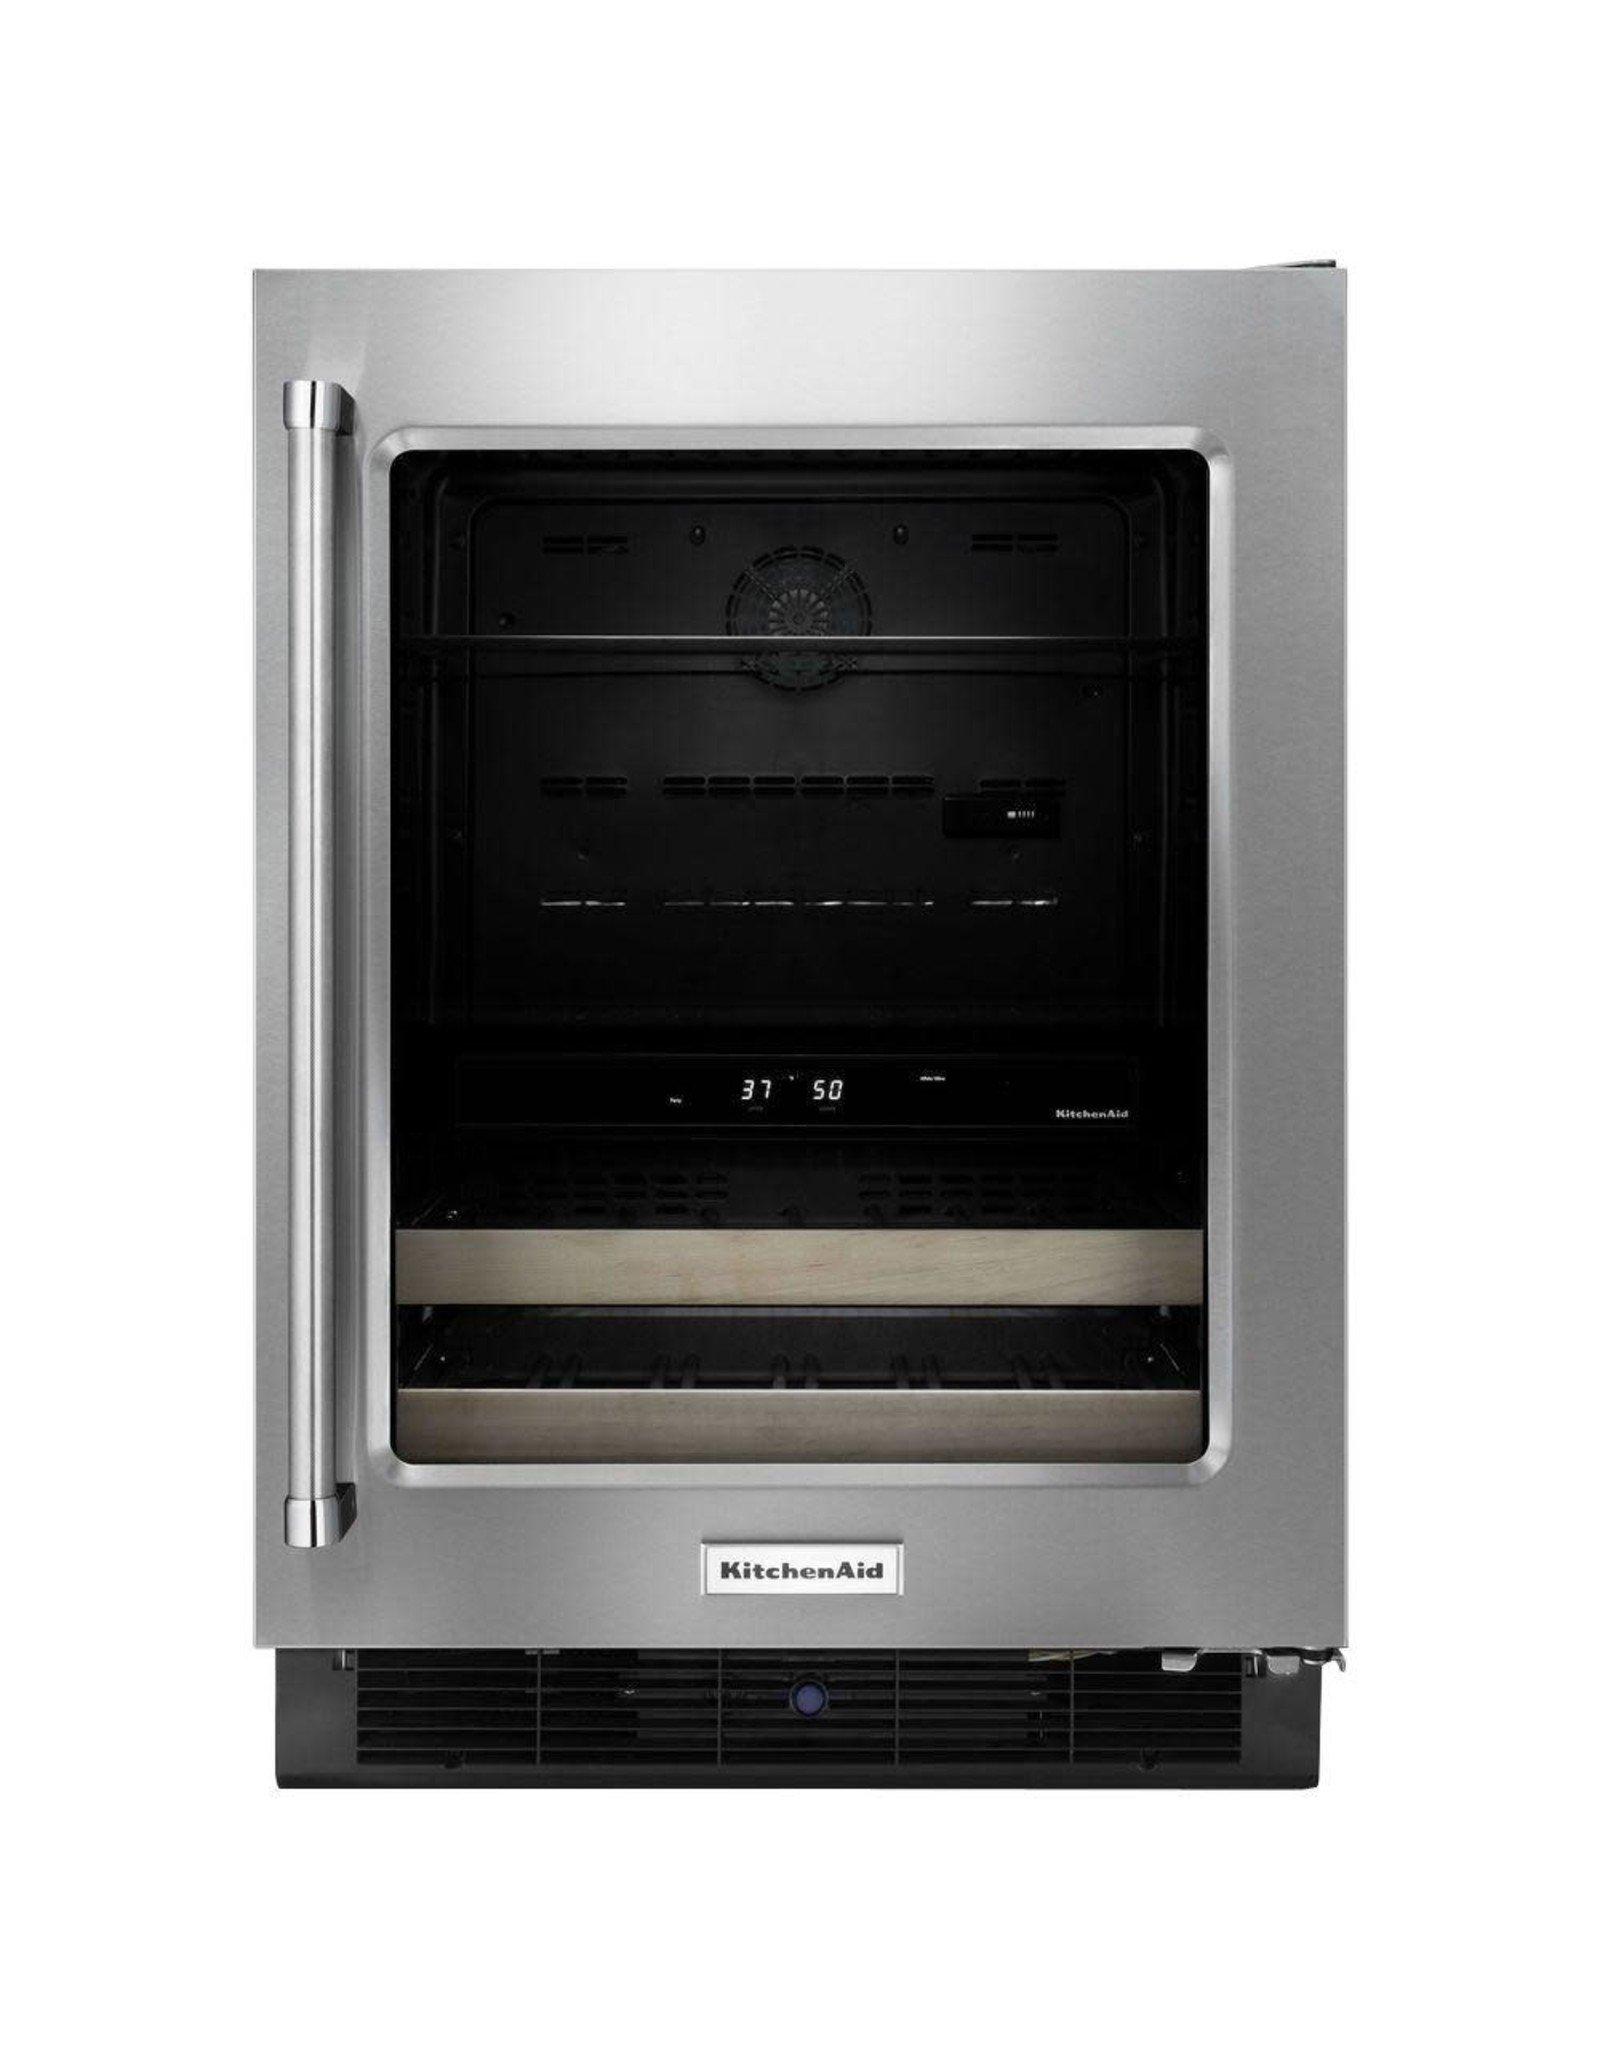 KUBR204ESB KAD Licensed Free Standing Refrigerator - 6 CU FT, 14 BOTTLES, DUAL ZONE, PROXIMIT